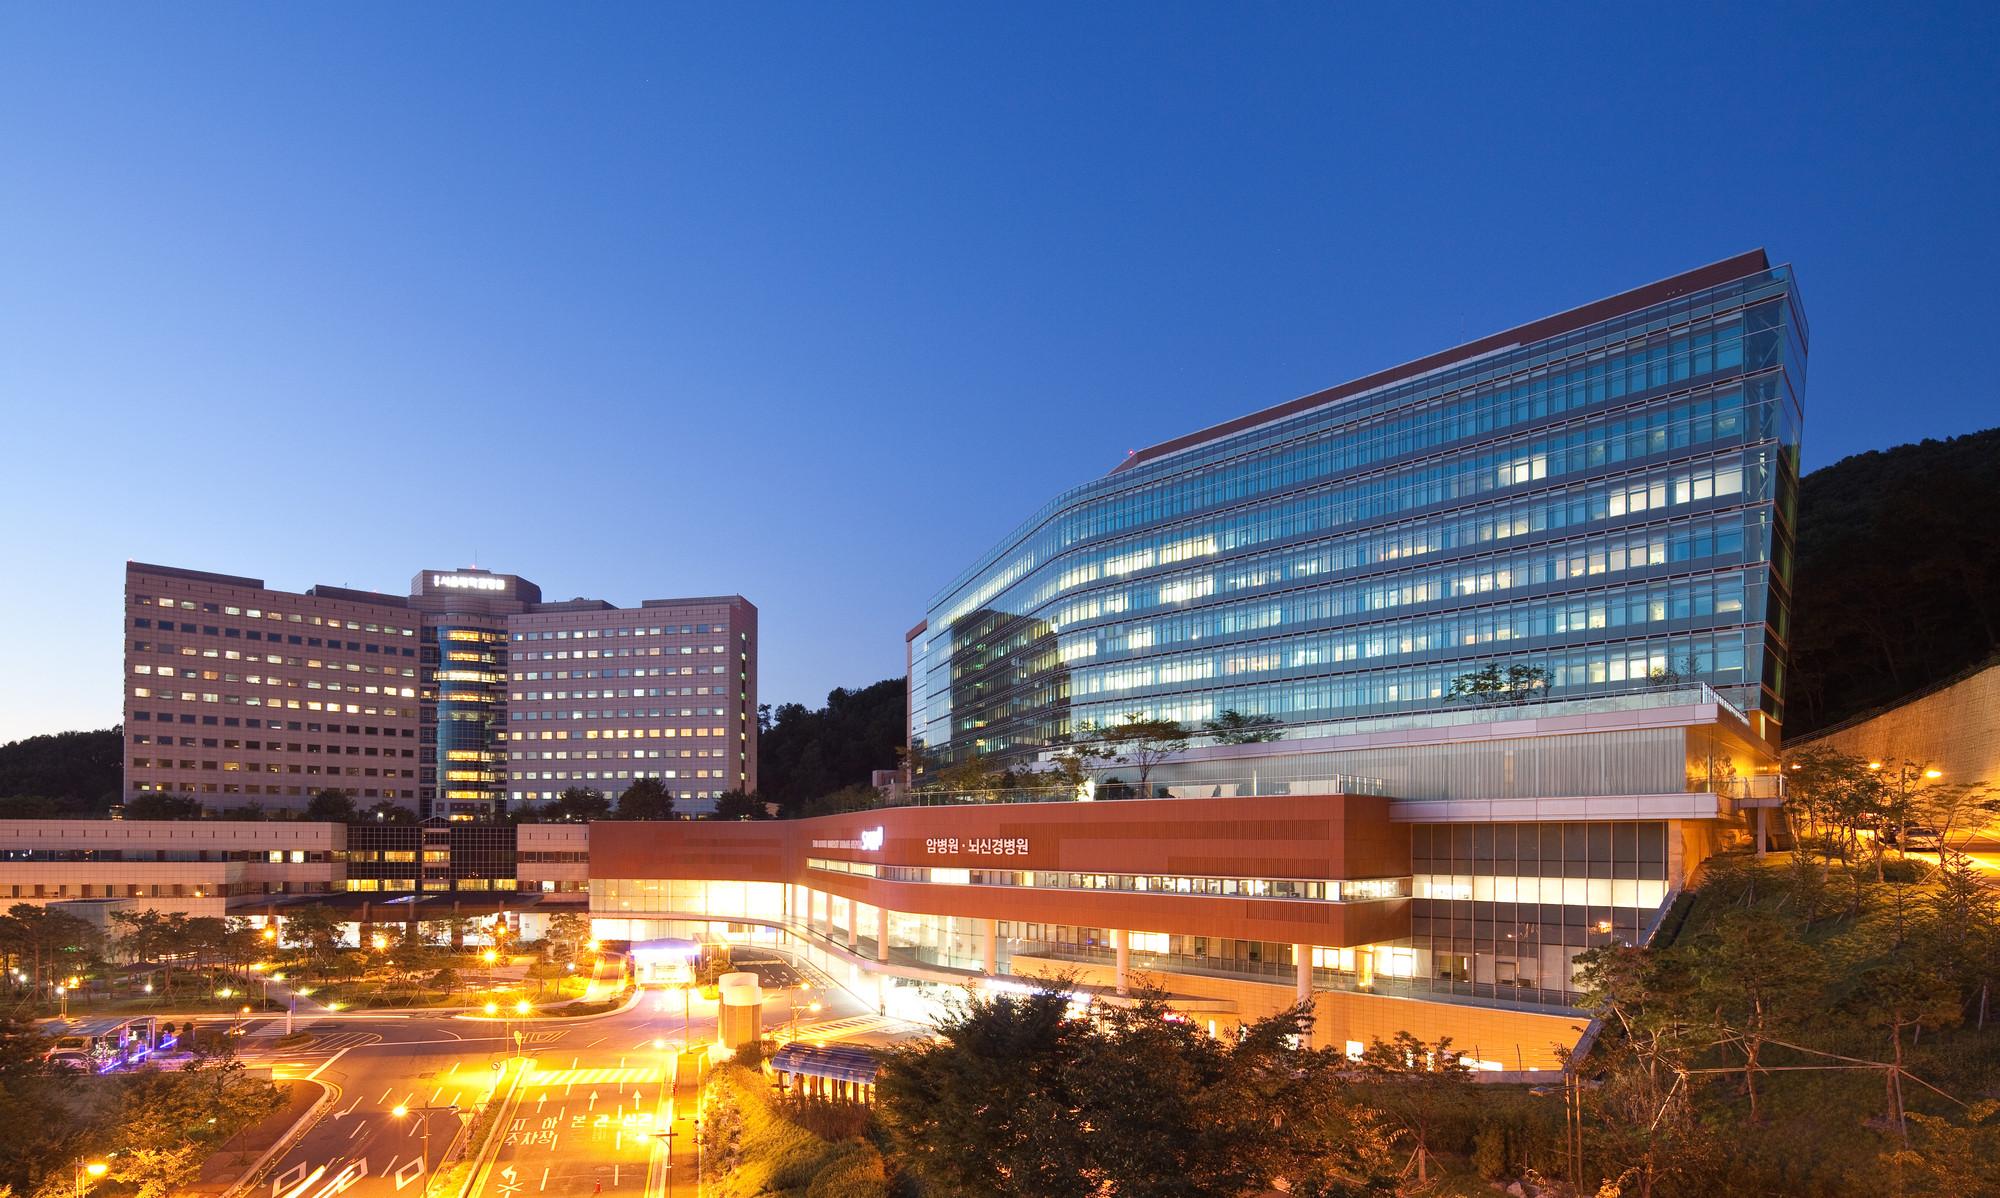 sekolah kedokteran terbaik di Korea - seoul national university